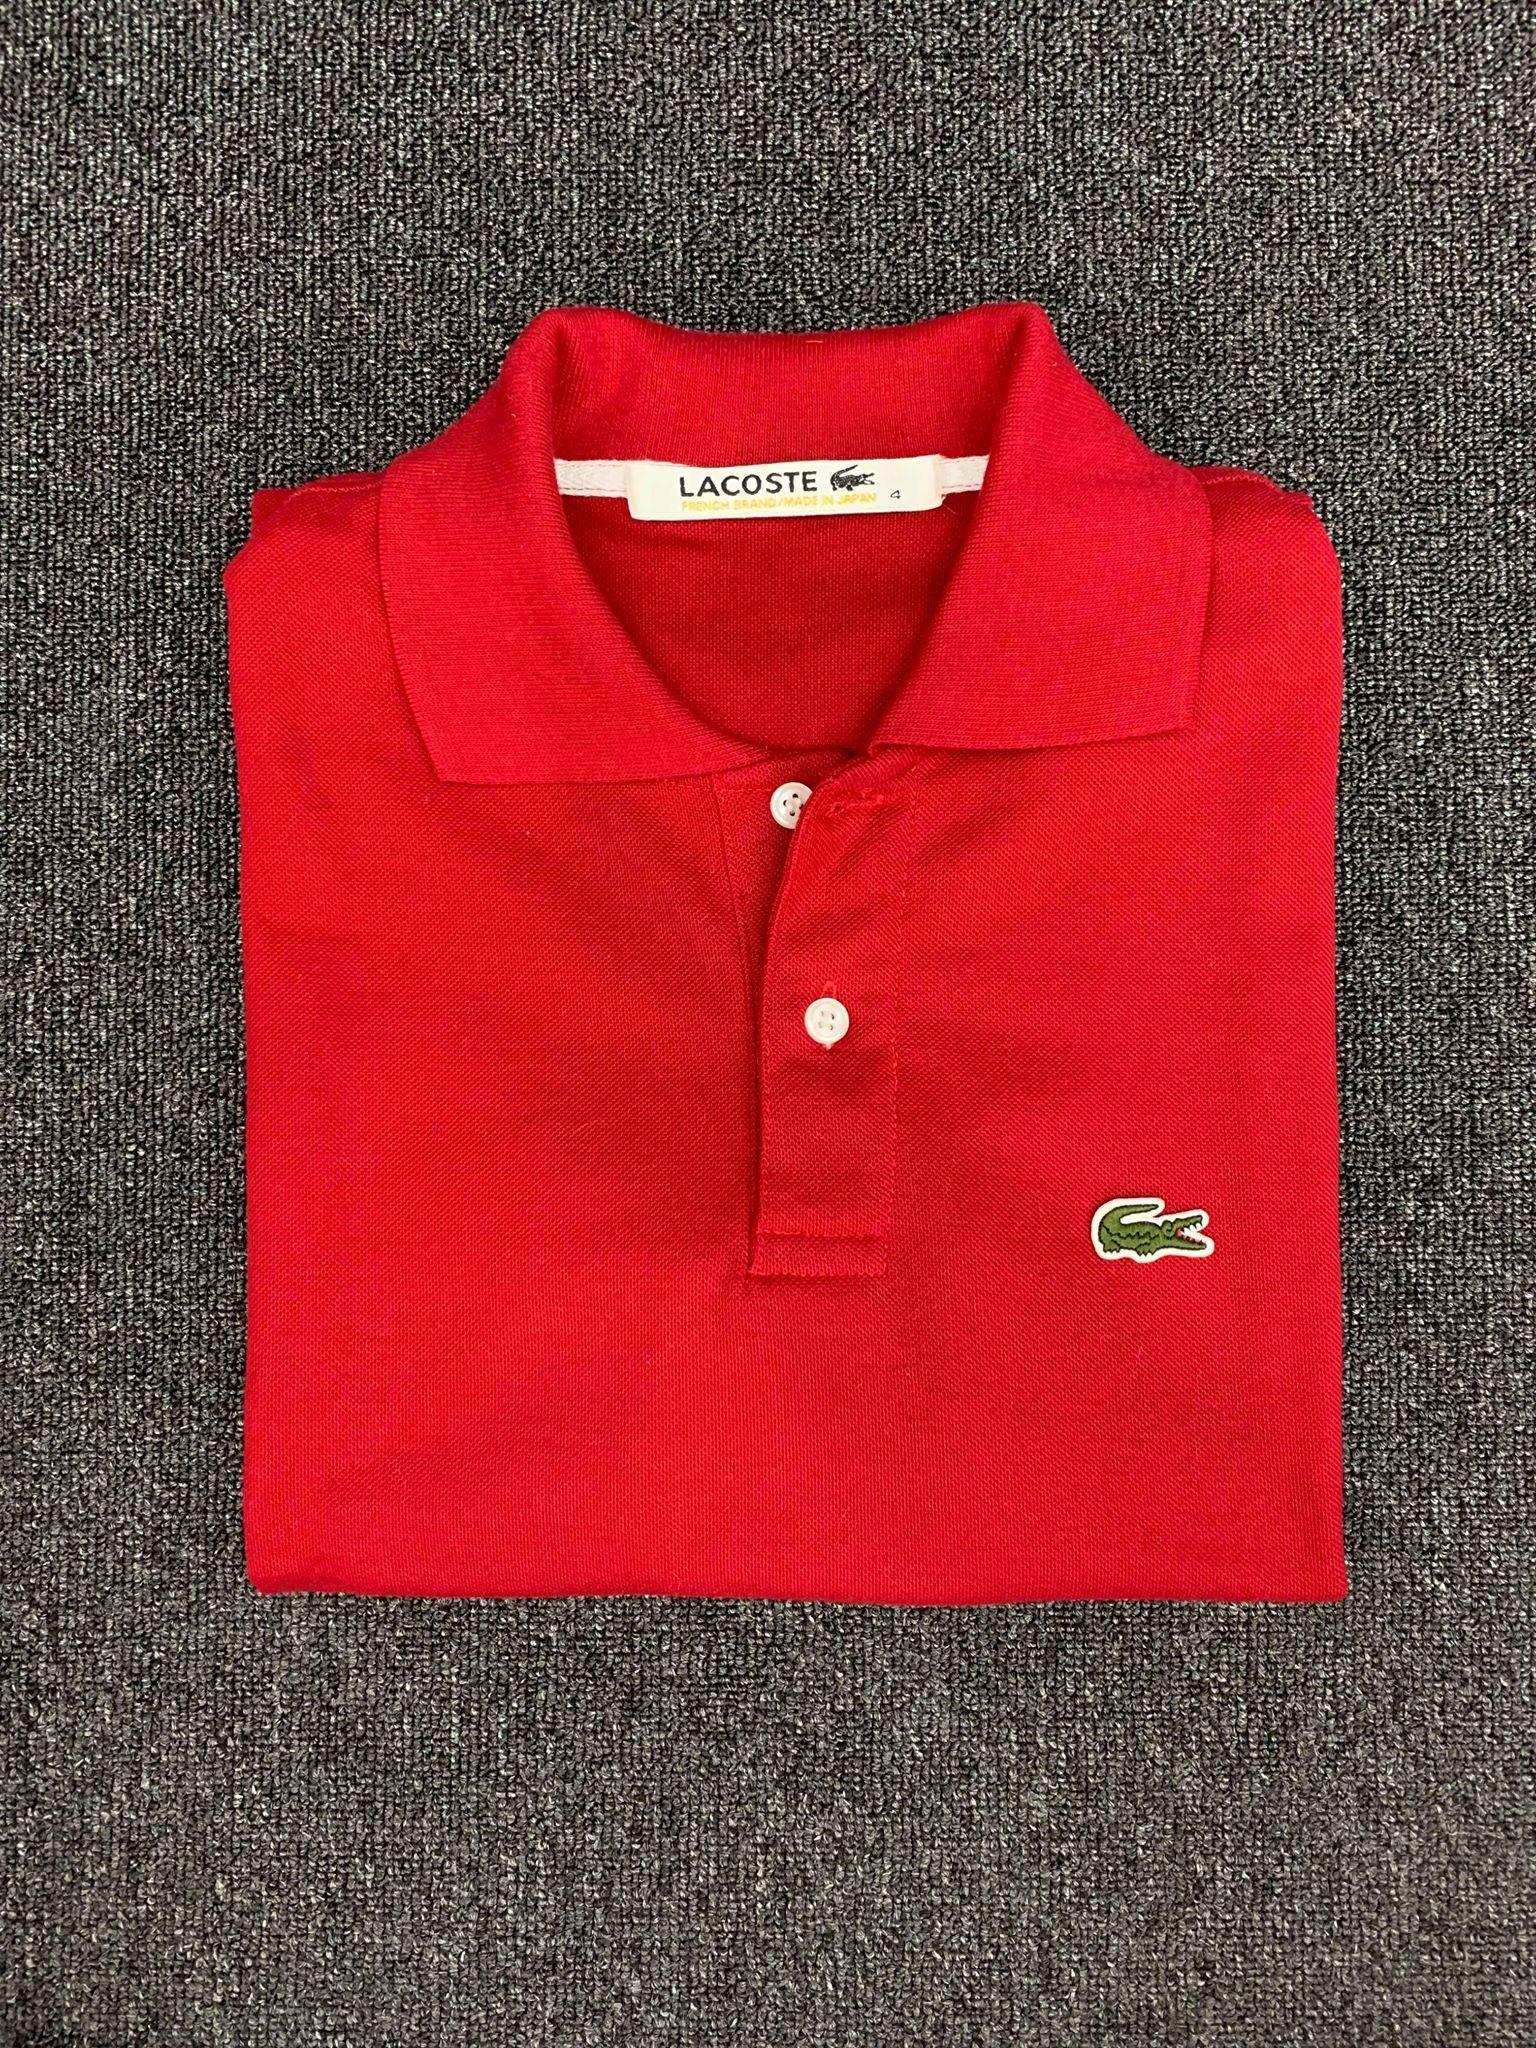 a0ca279a Men's Lacoste Polo Shirt (CLASSIC)+ FREE 1PC T Shirt